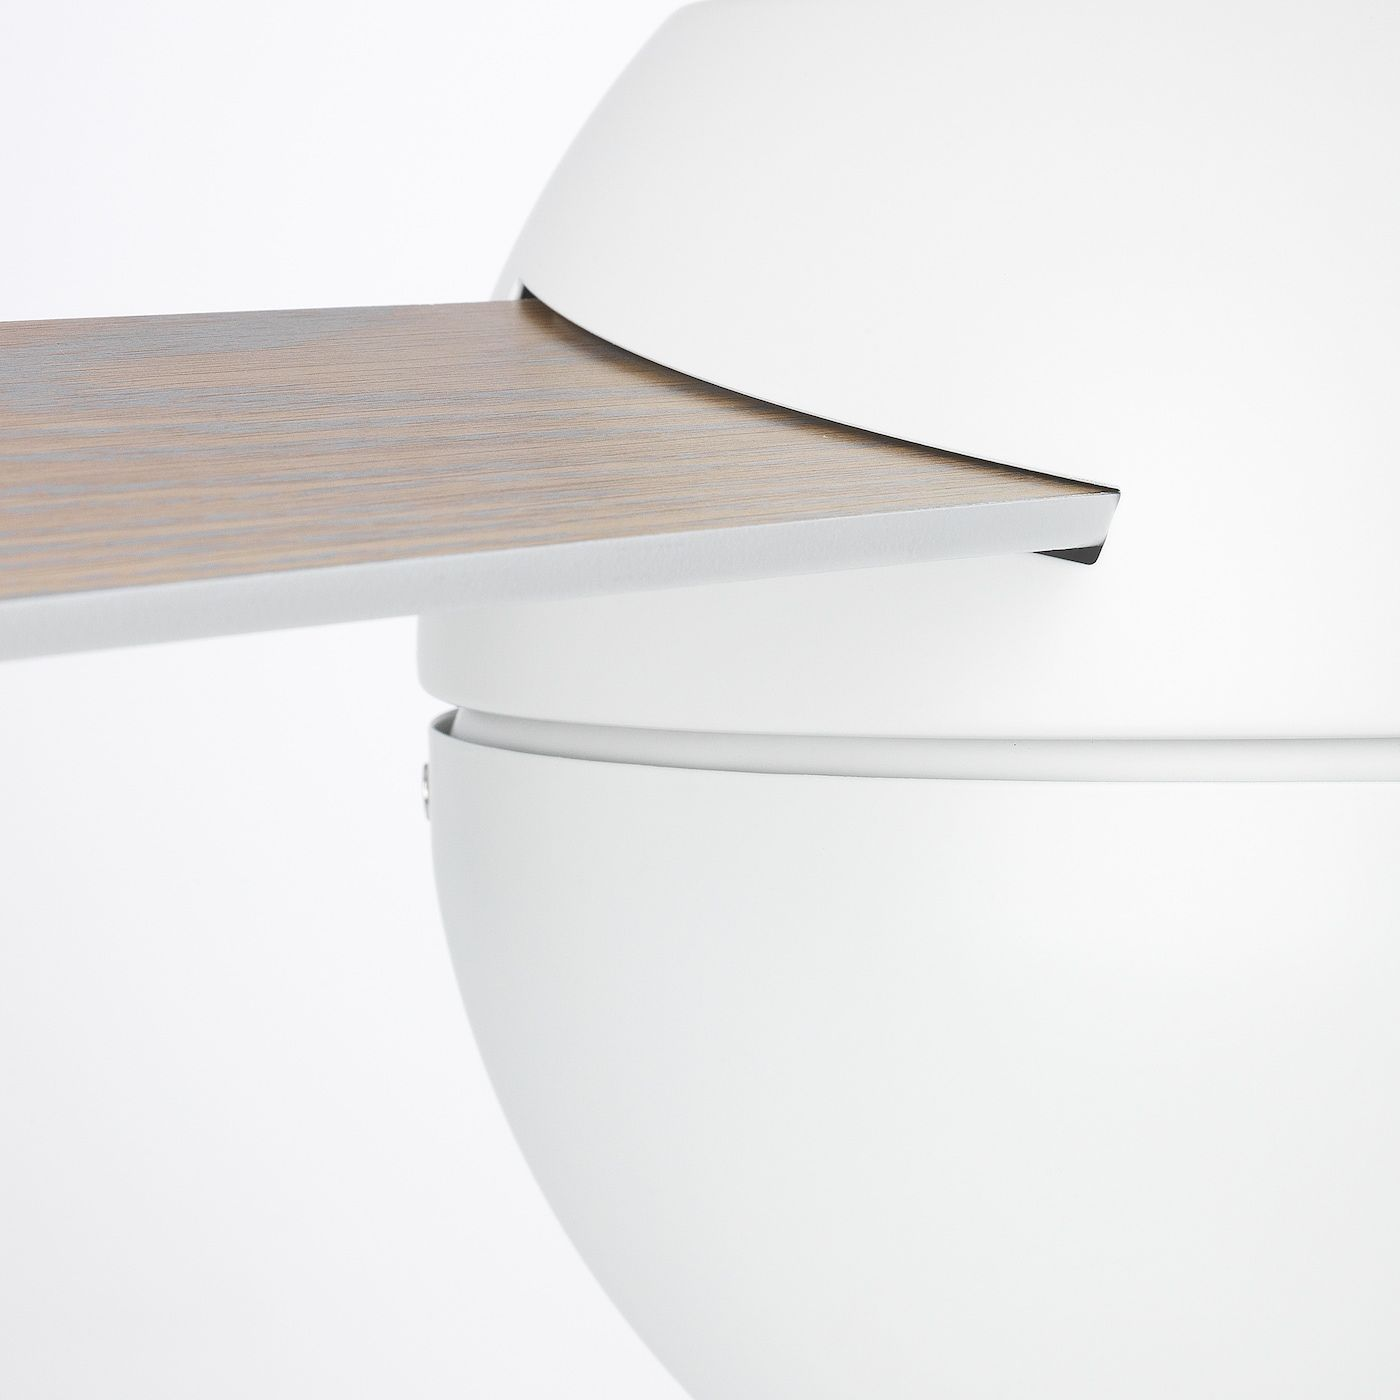 Ikea Stormvind 3 Blade Ceiling Fan With Light In 2020 Ceiling